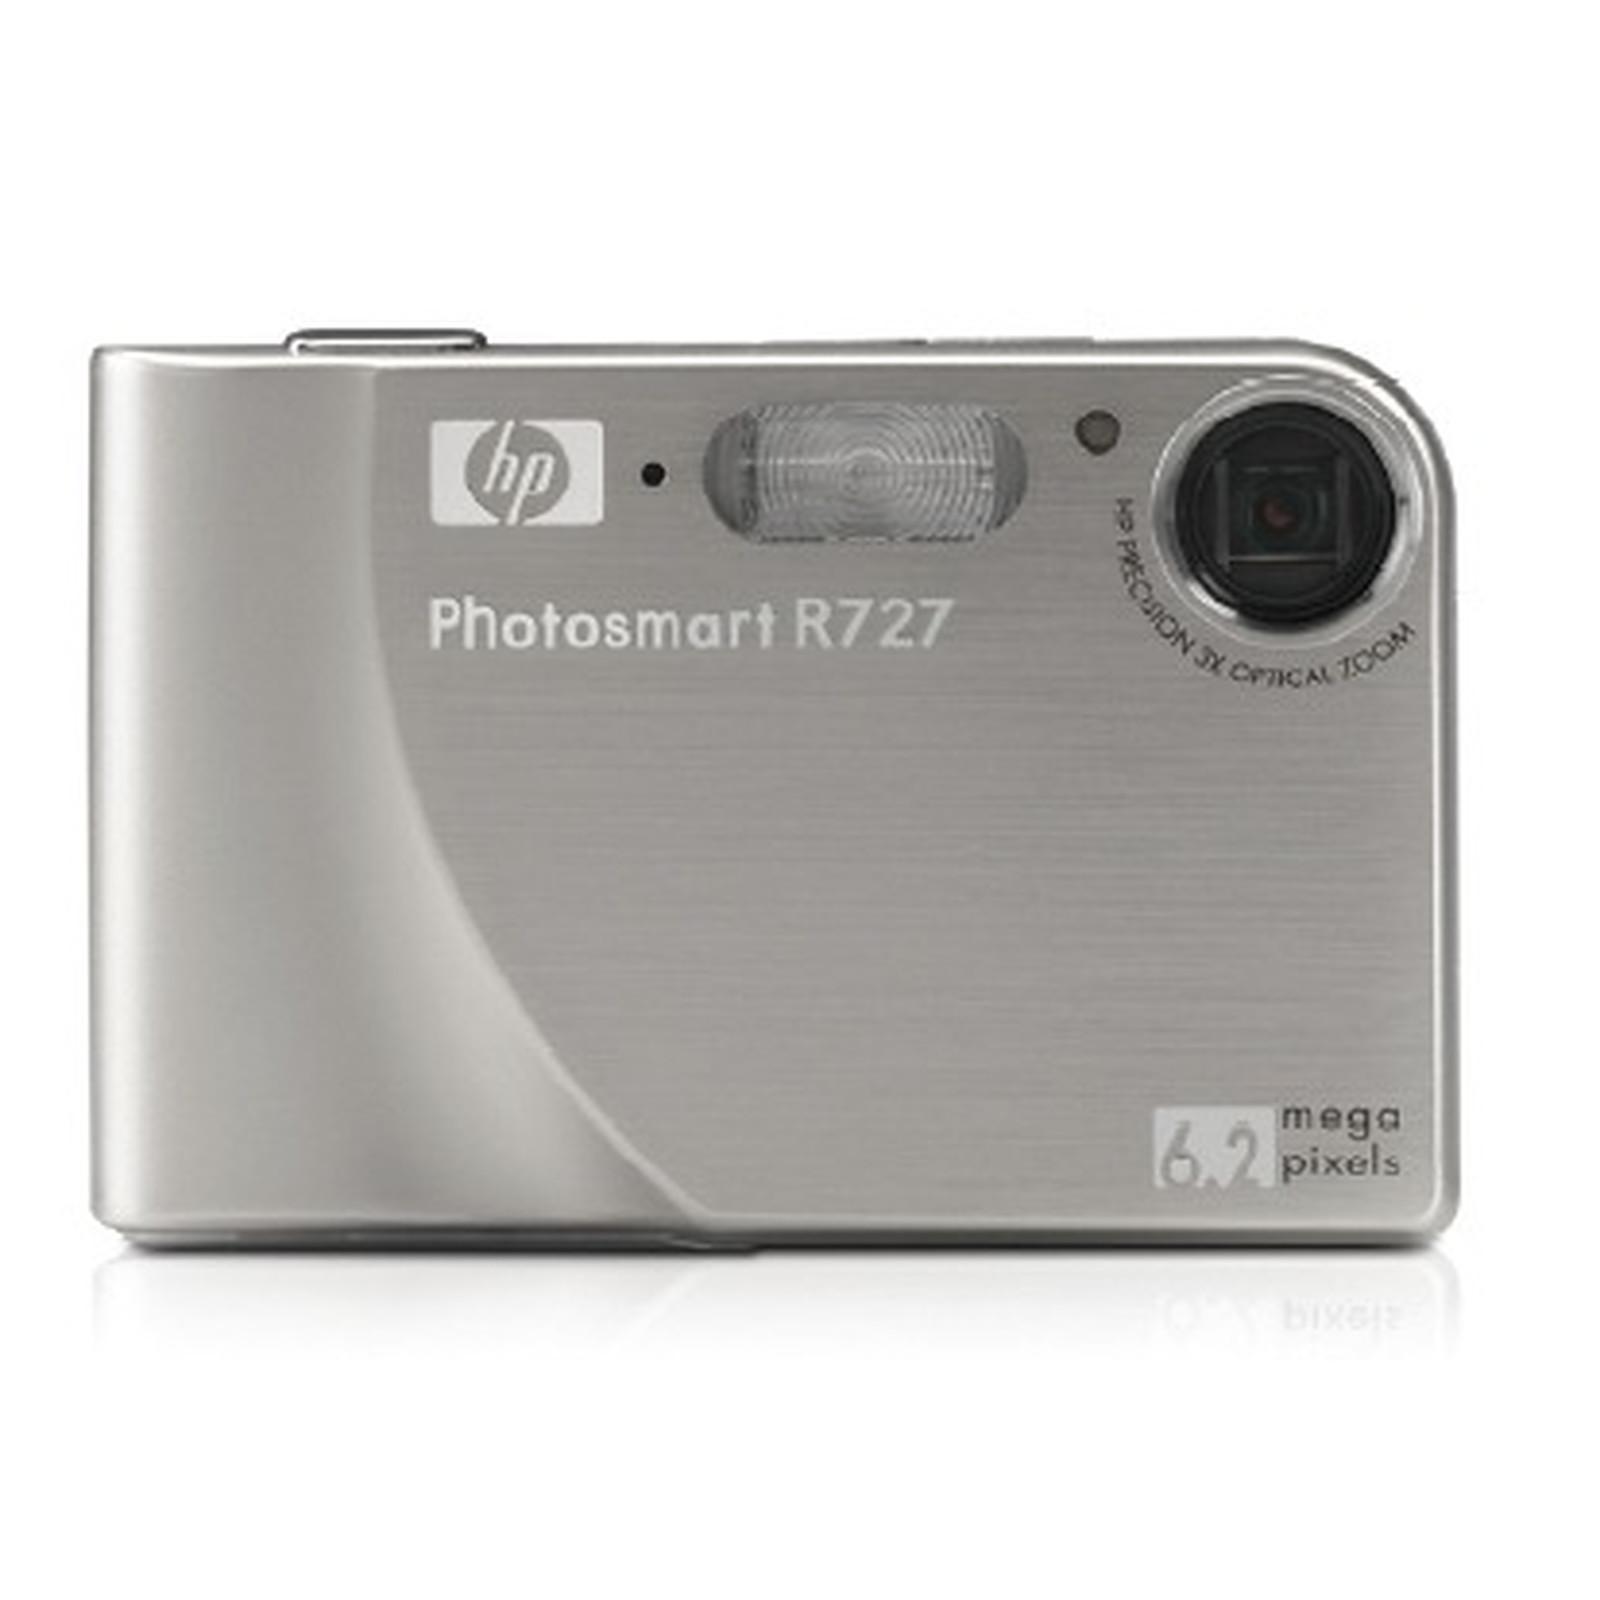 HP Photosmart R727 L2070A#BCA